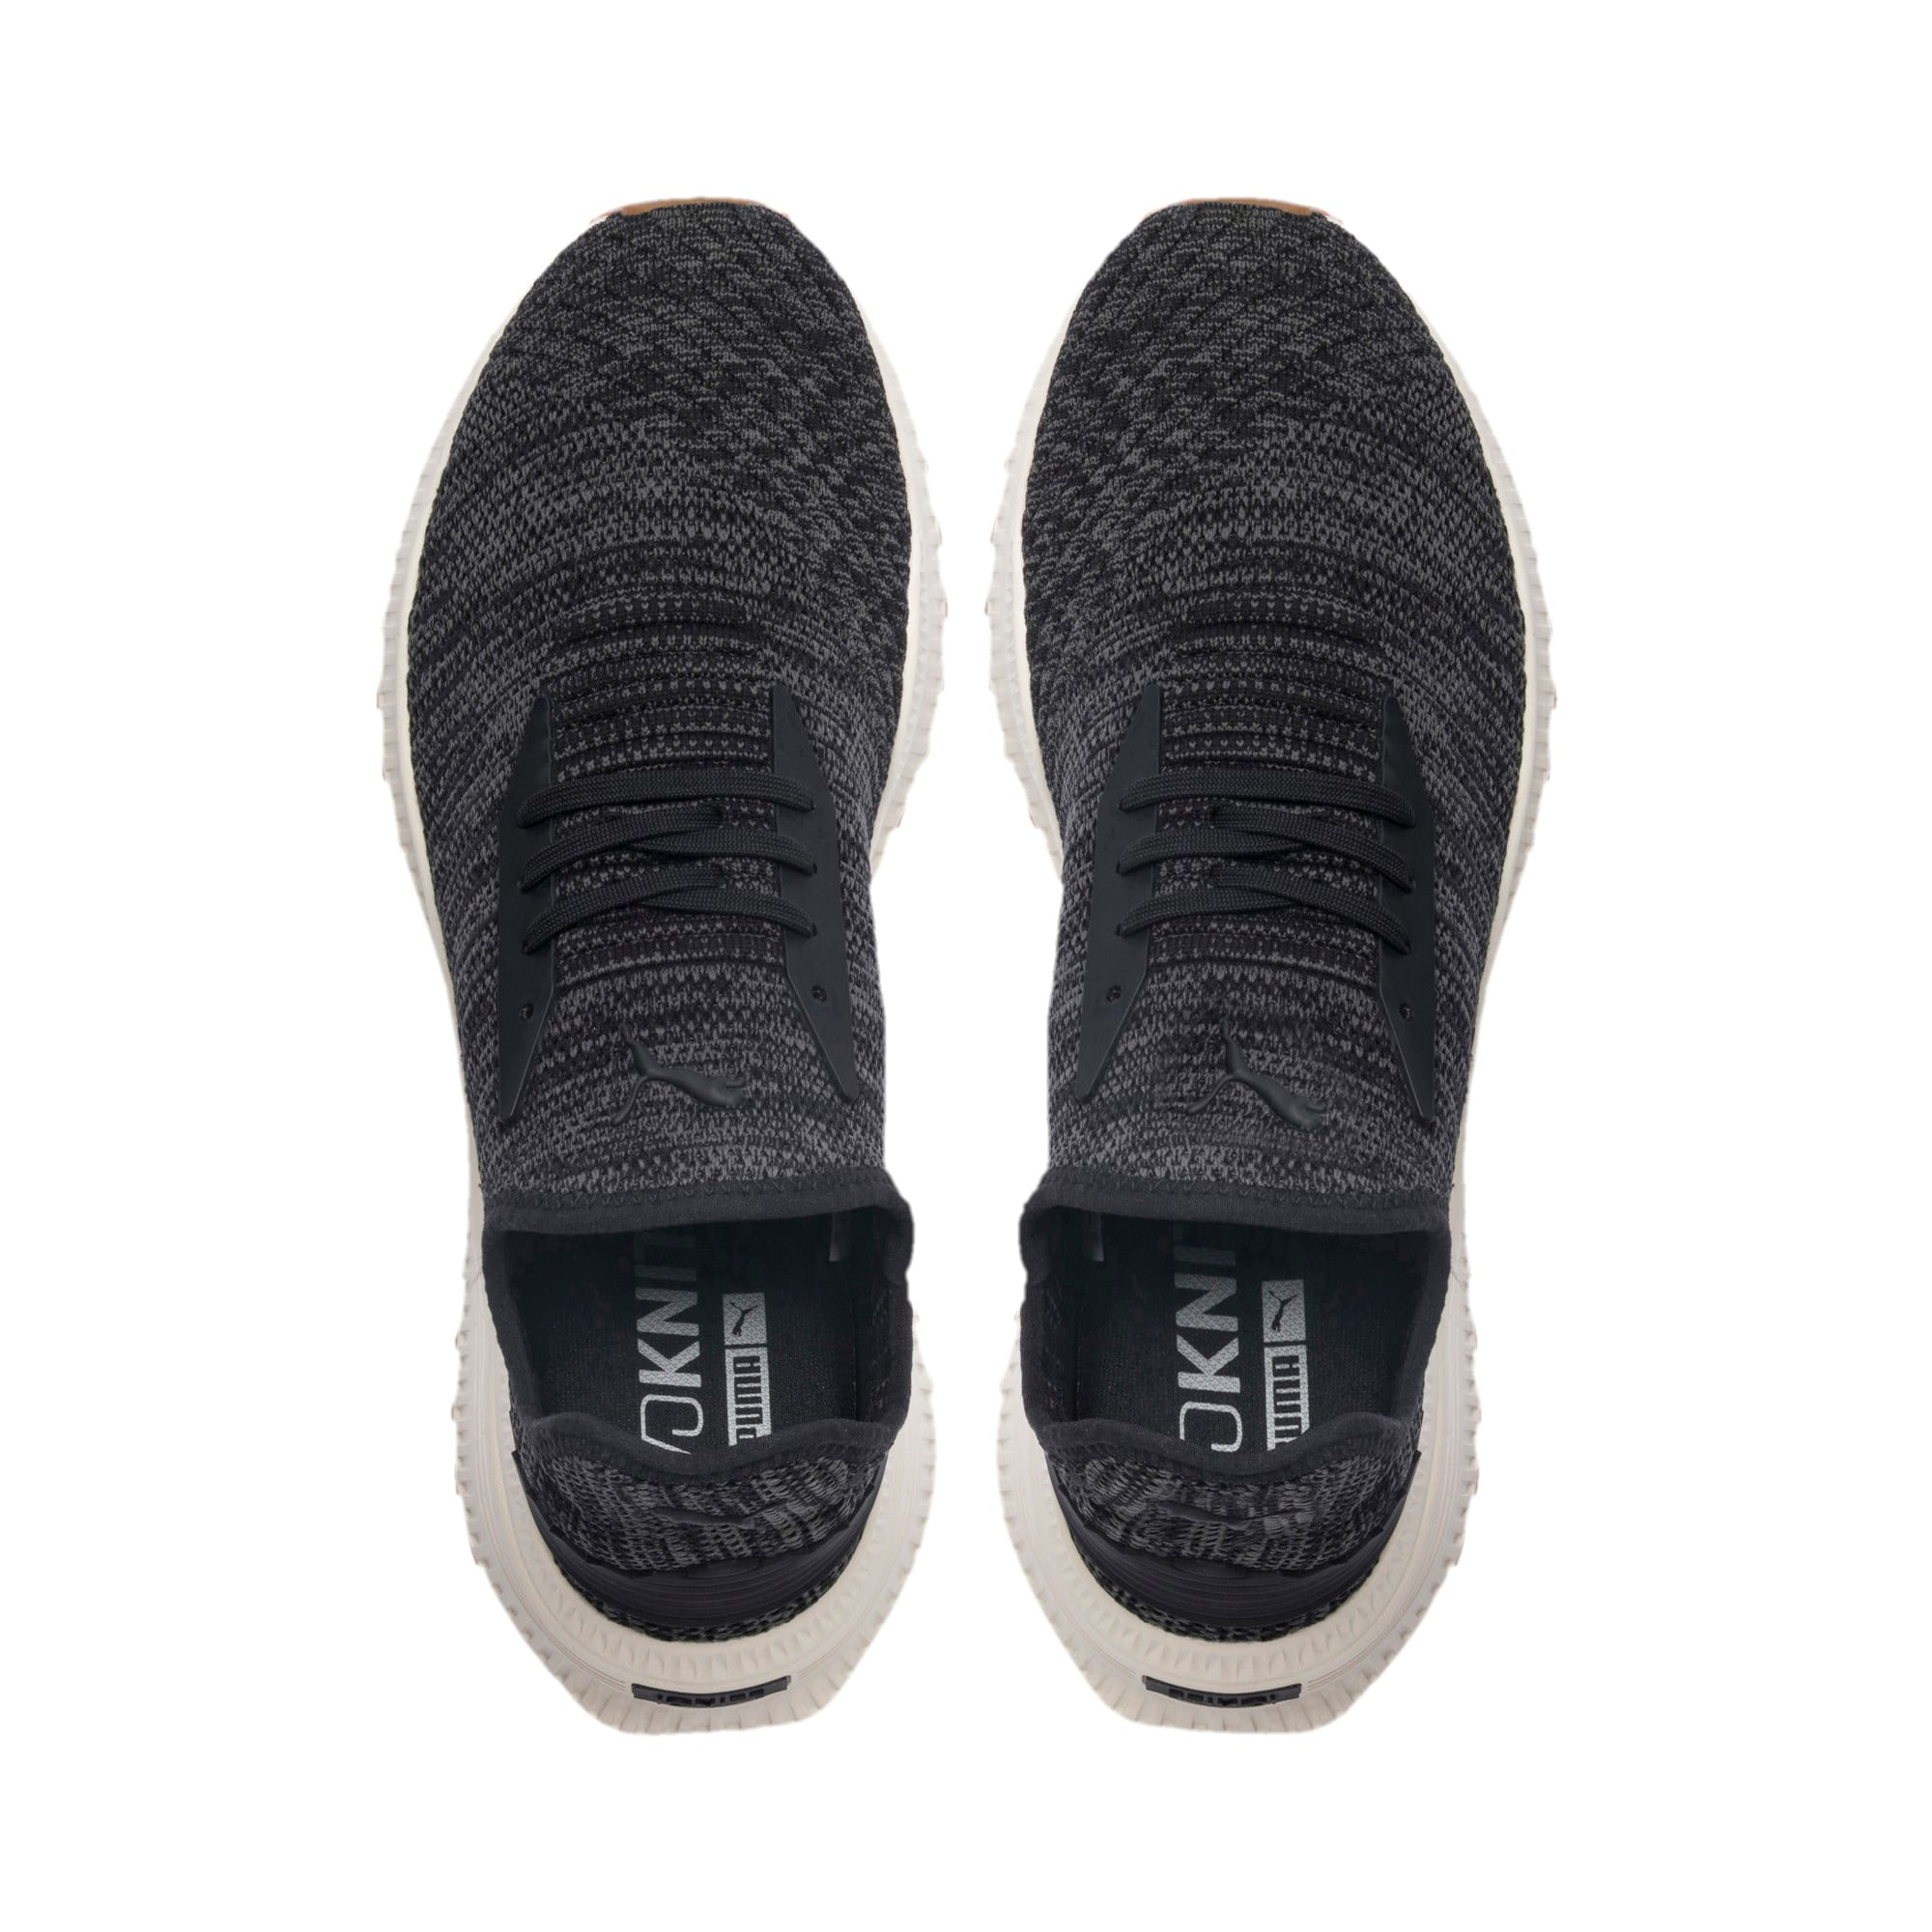 Thumbnail 6 of AVID Repellent Sneakers, Puma Black-Dark Shadow, medium